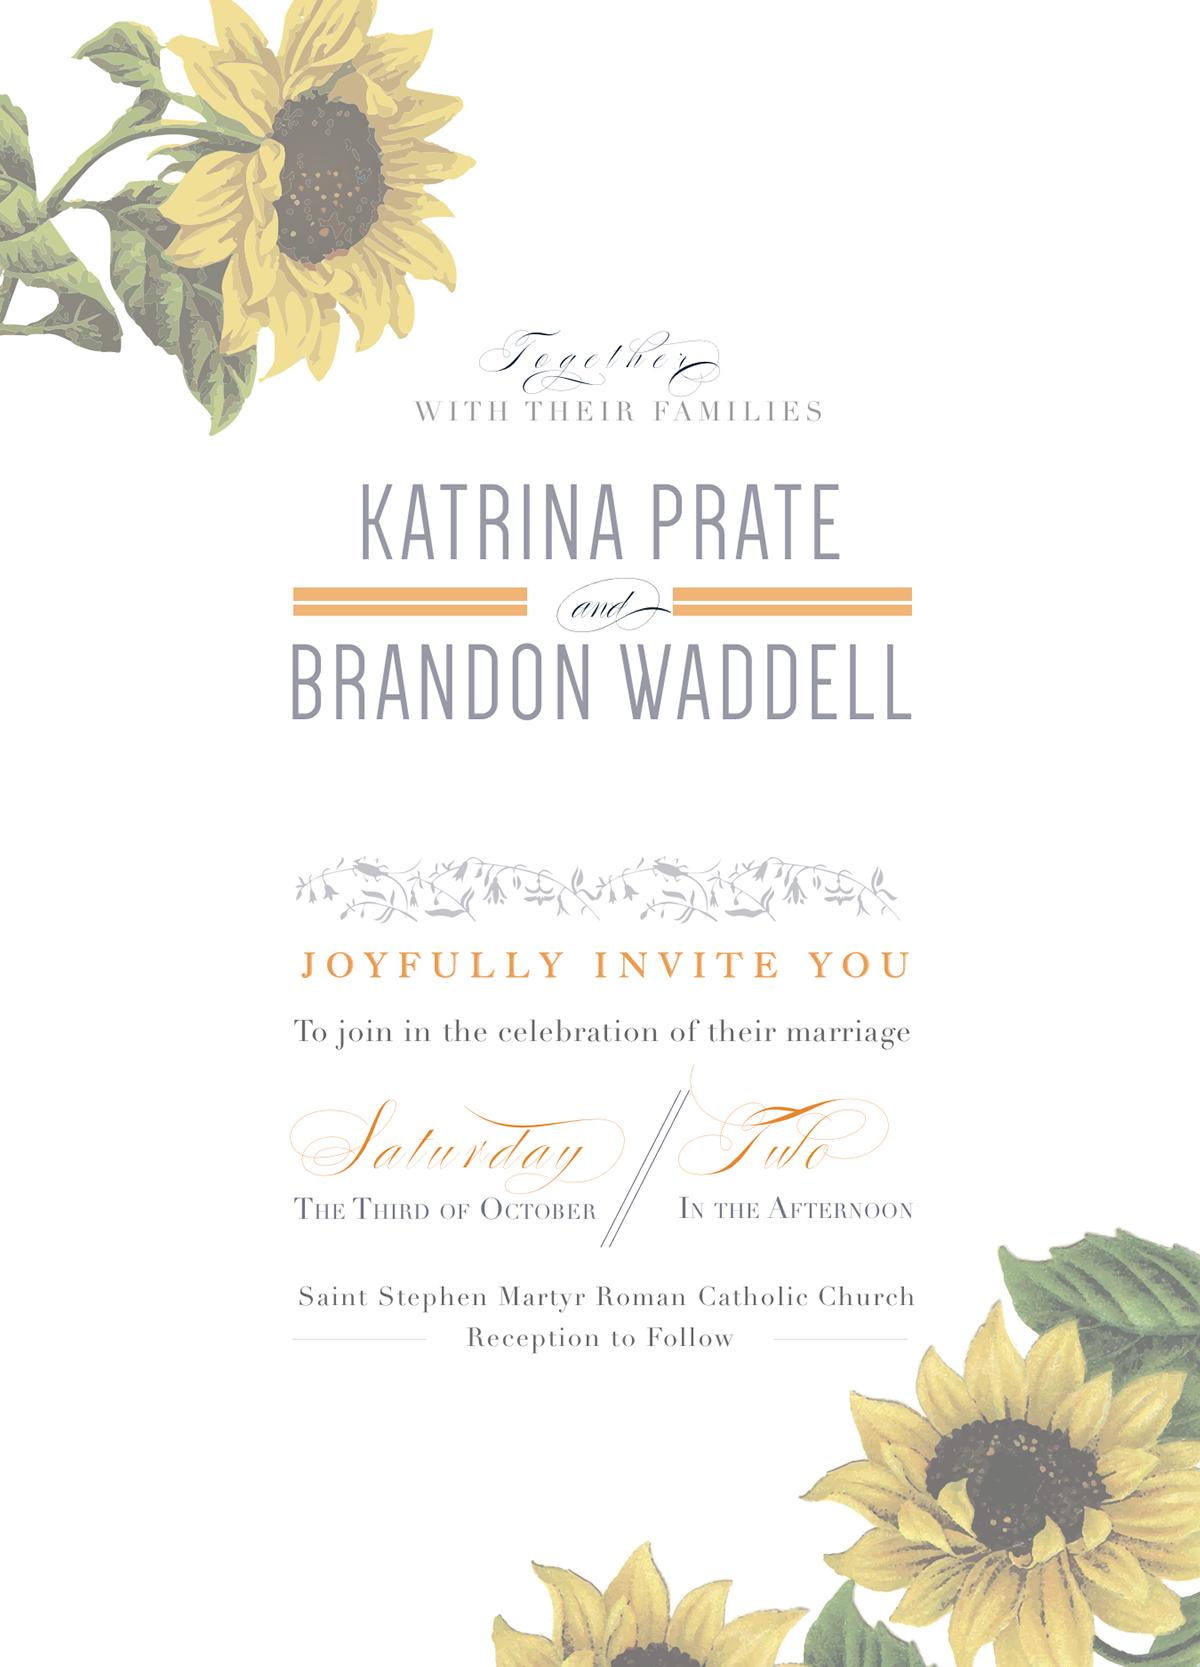 Wedding Invitation Suite on Behance